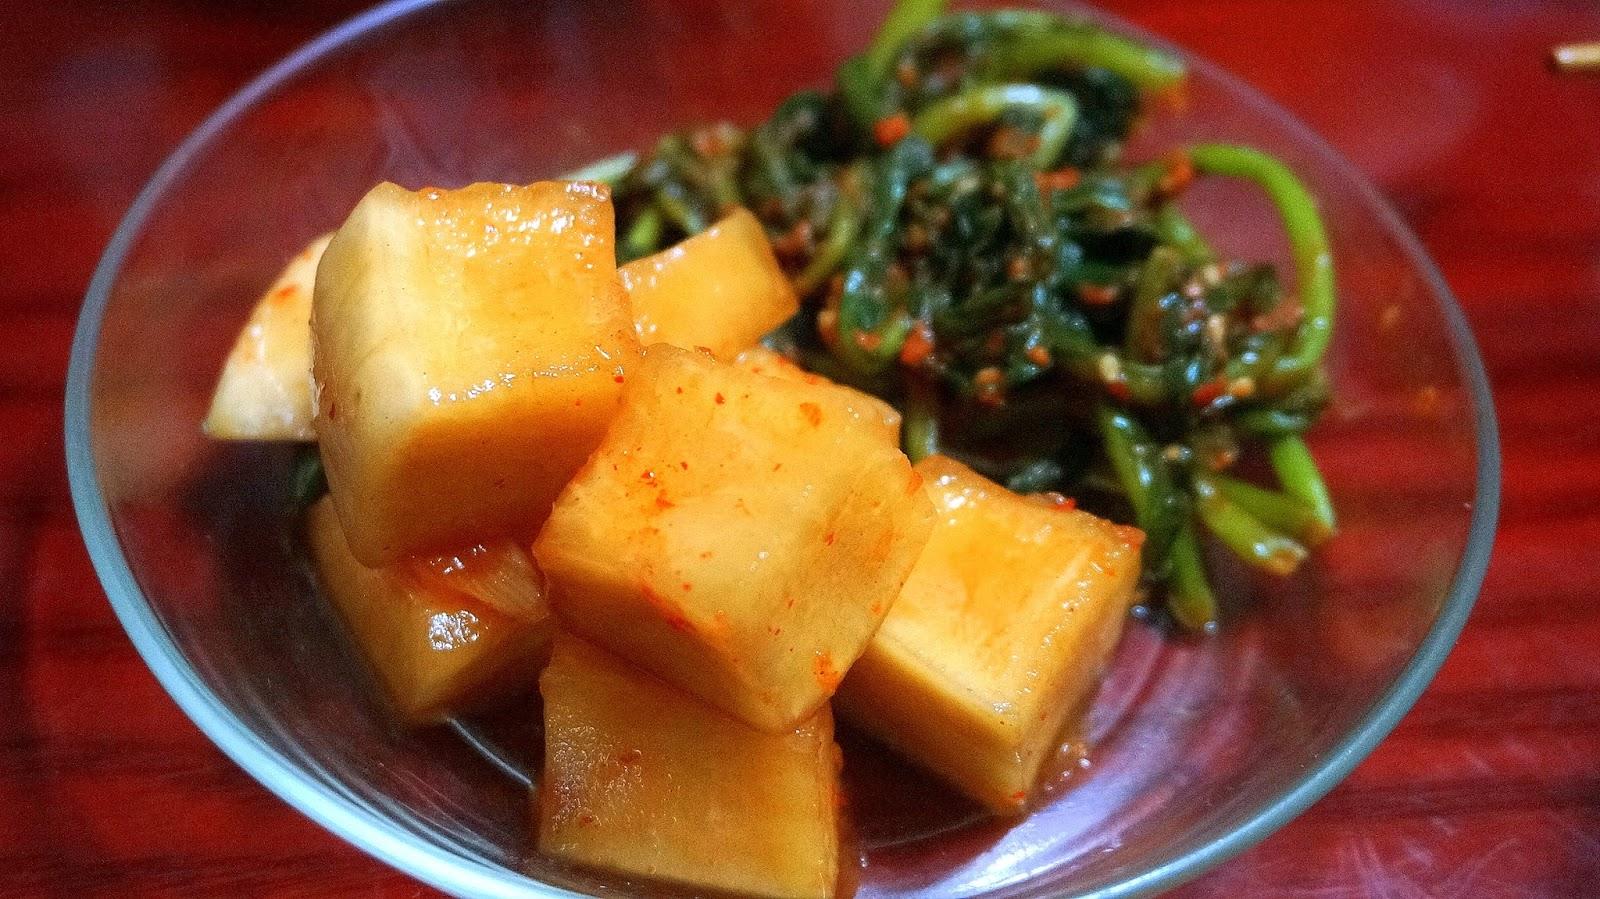 Recipe: Kkakdugi 깍두기 (Cubed Radish Kimchi)